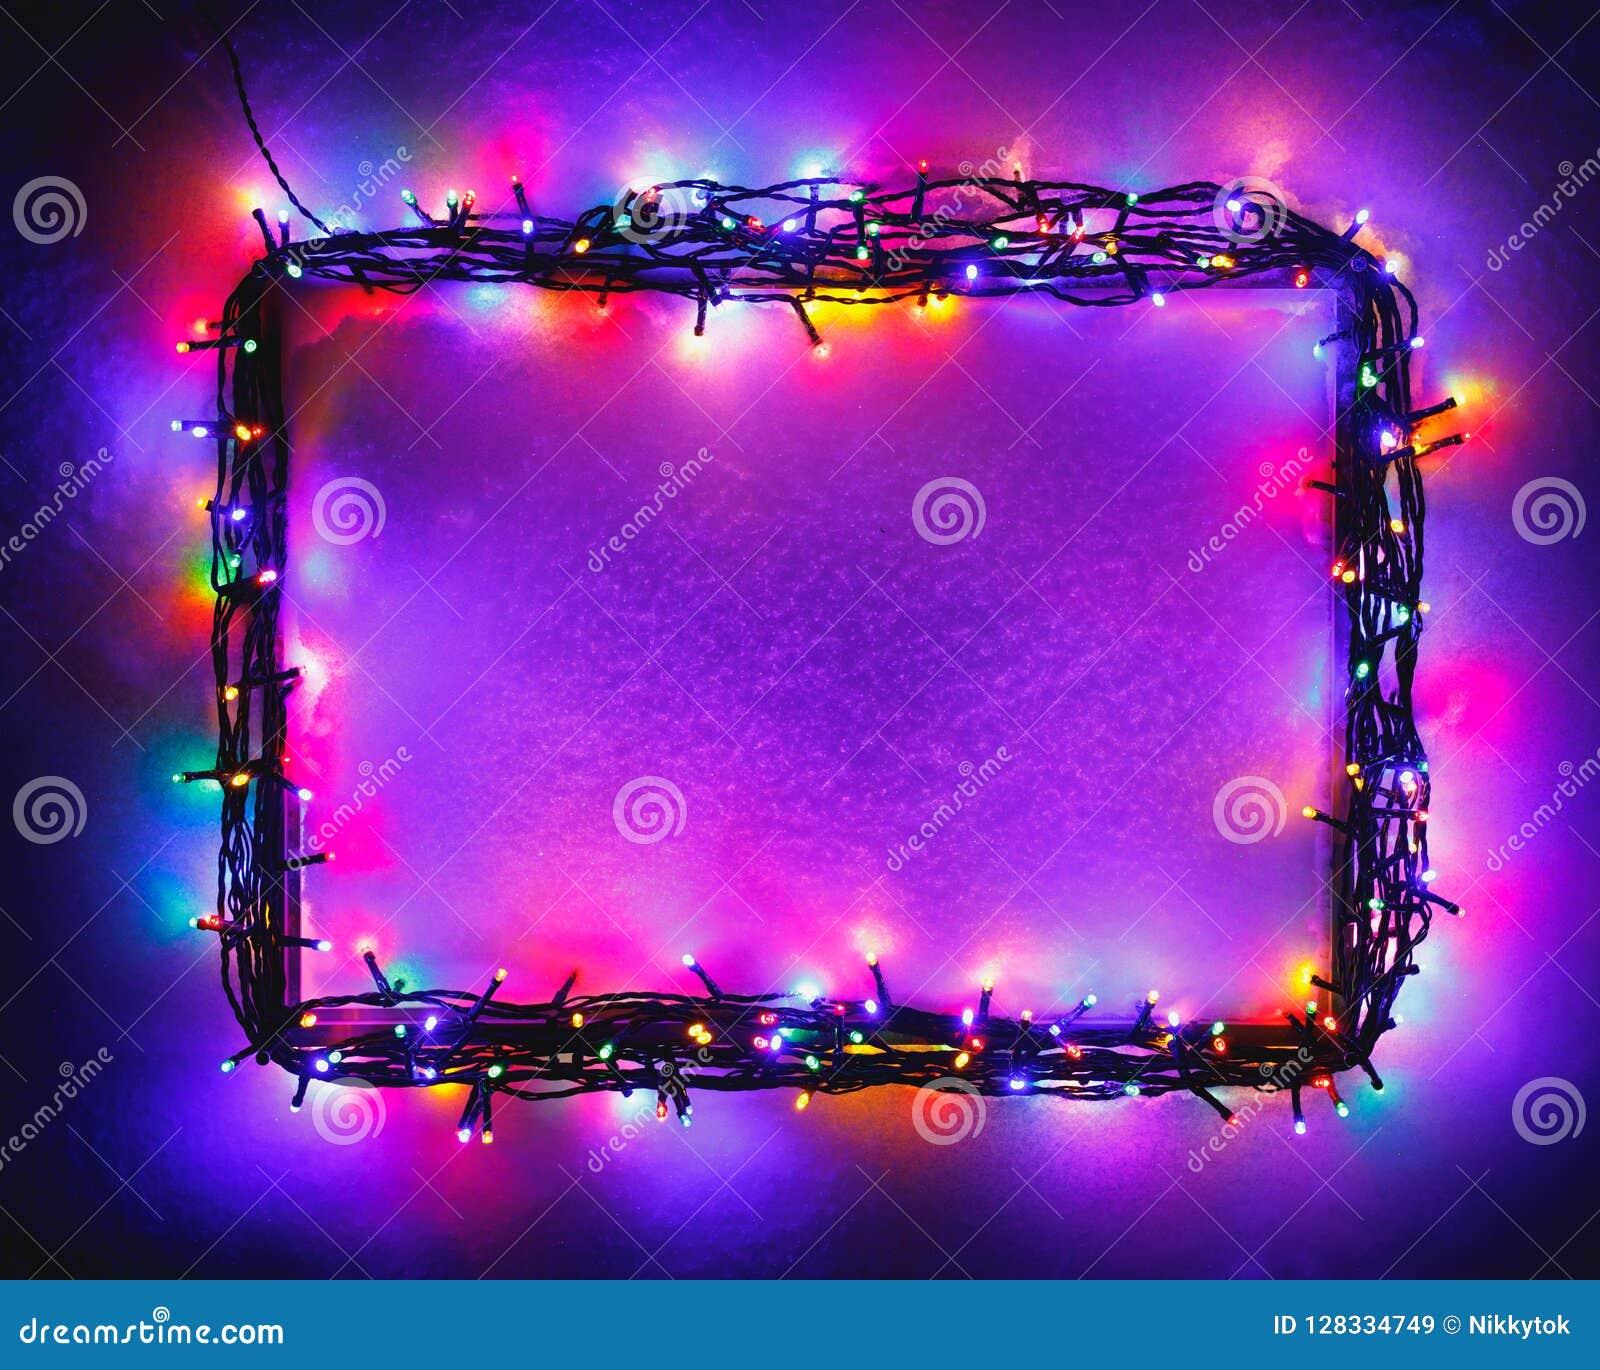 Christmas lights frame on snow background, purple color